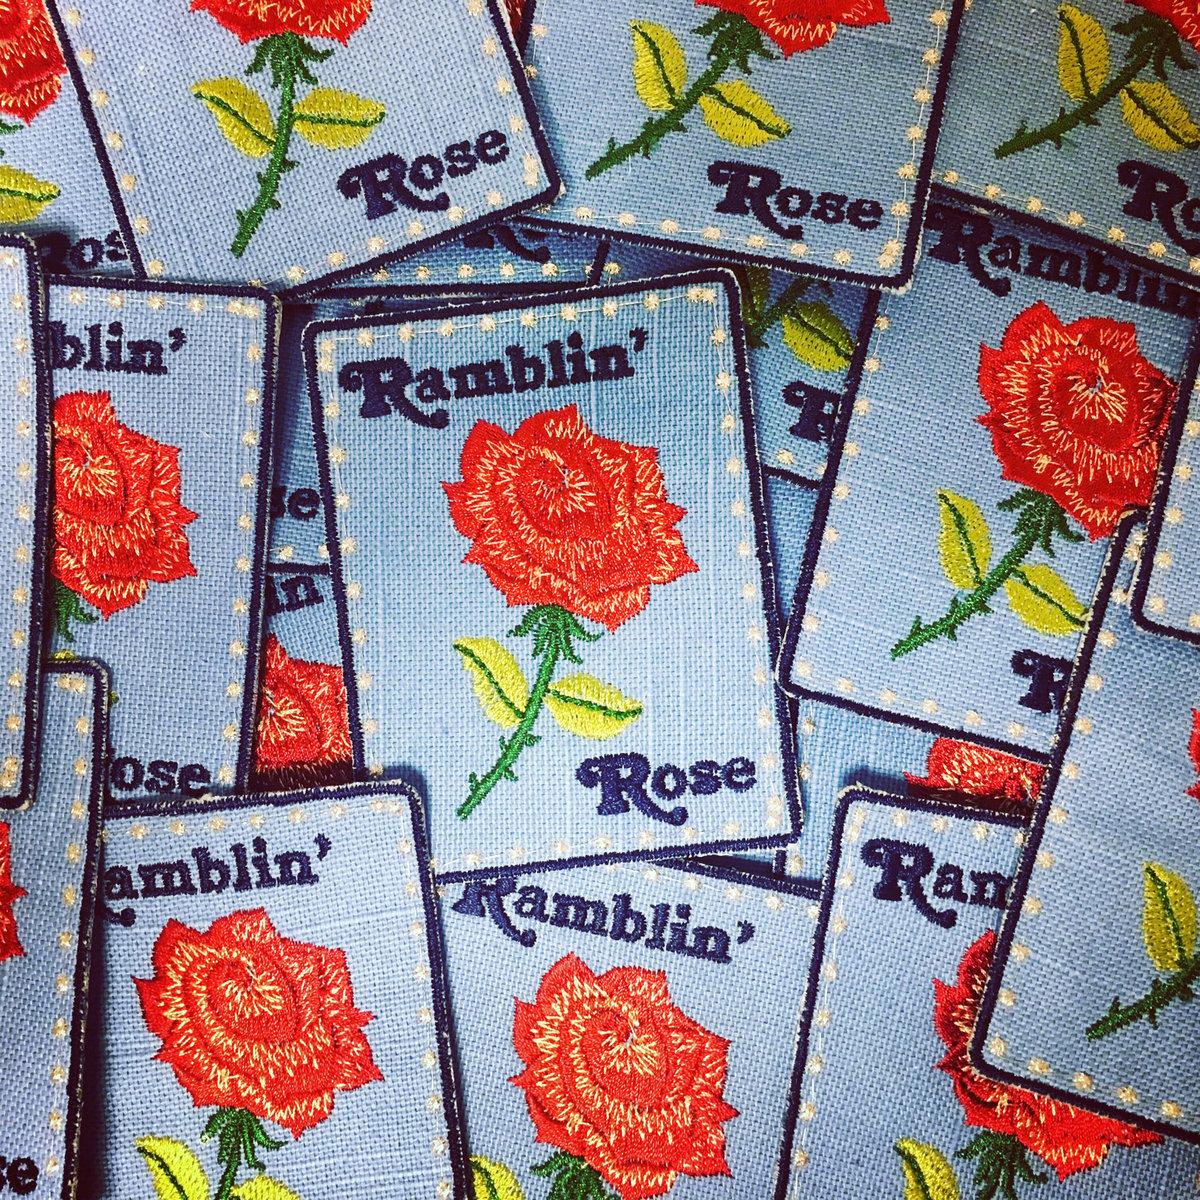 Ramblin' Rose Handmade Patch! 3x4